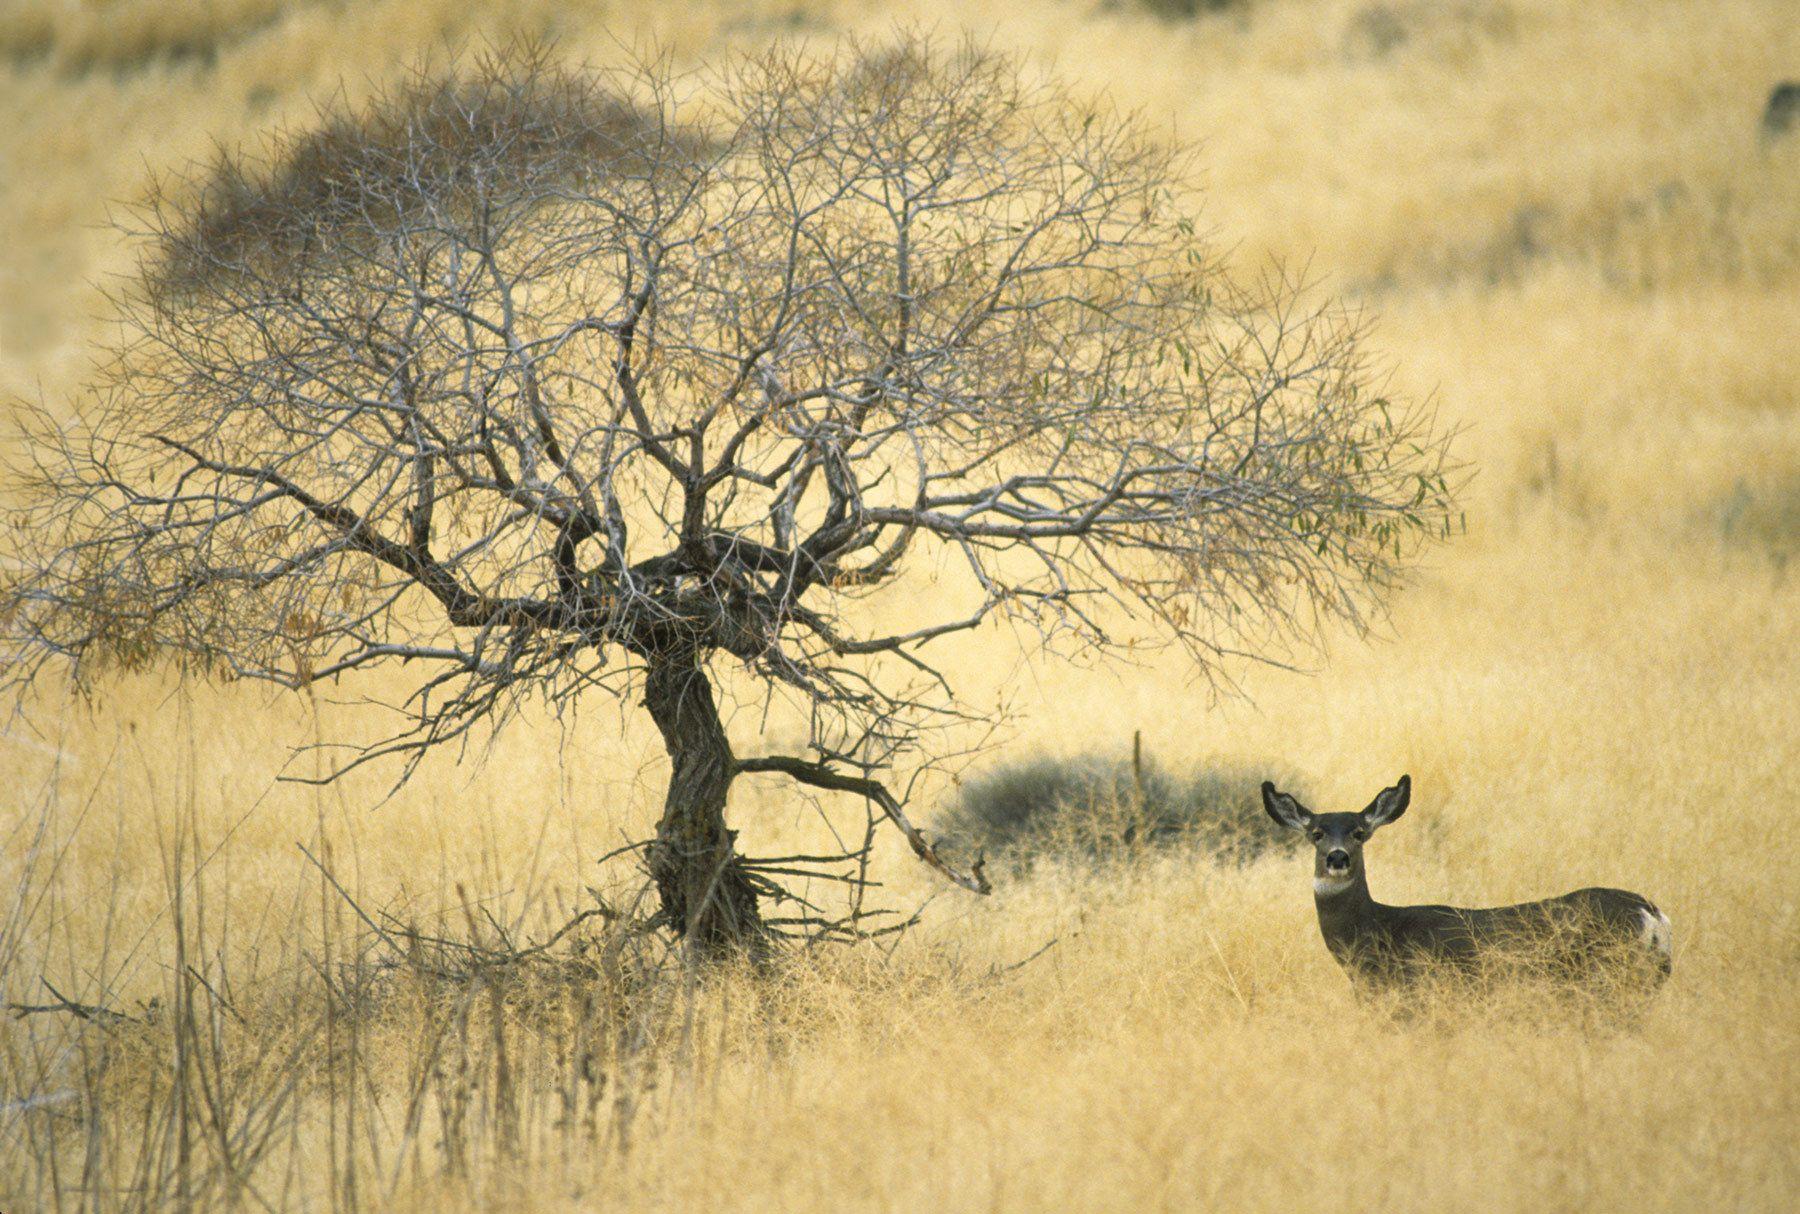 Tulelake National Wildlife Refuge